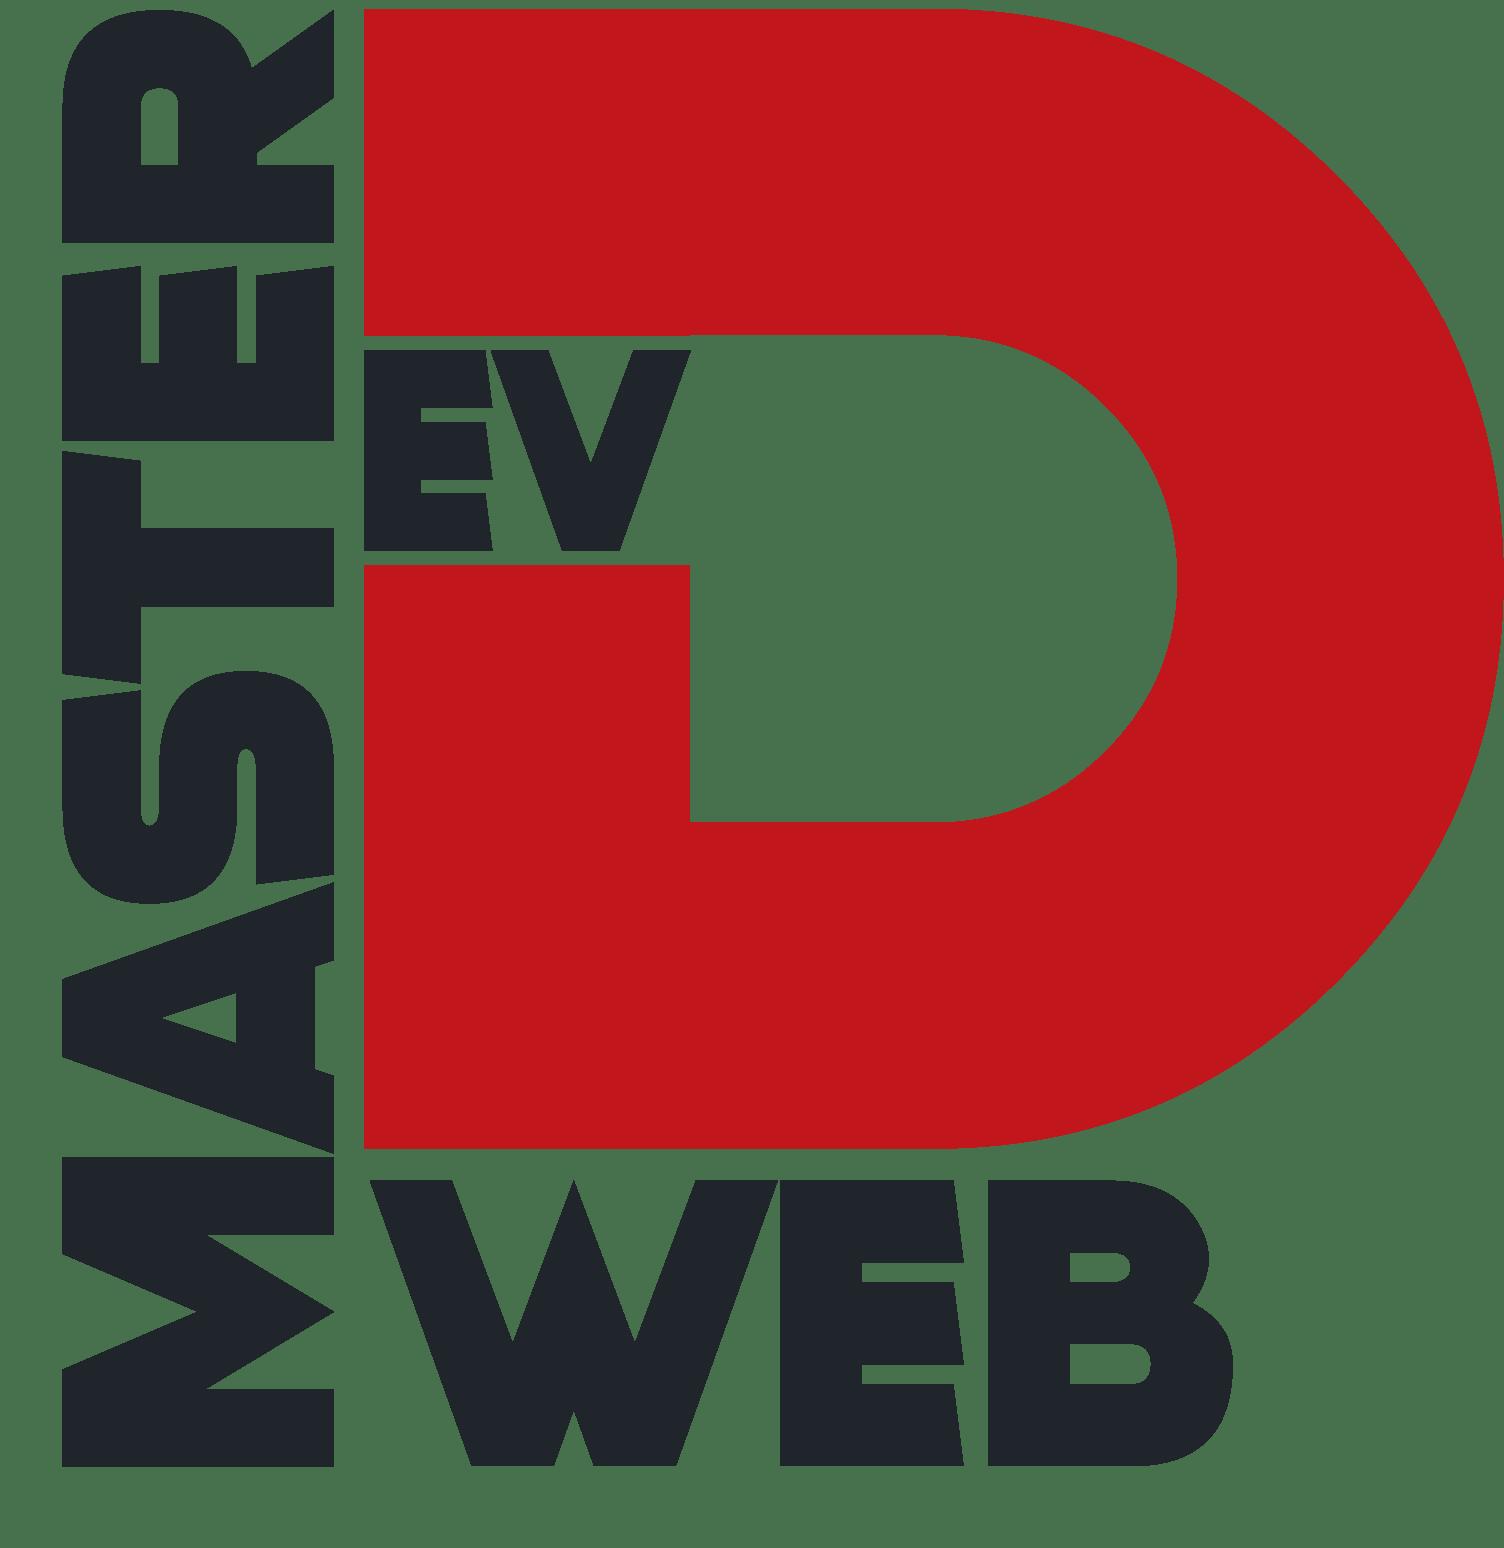 Devwebmaster